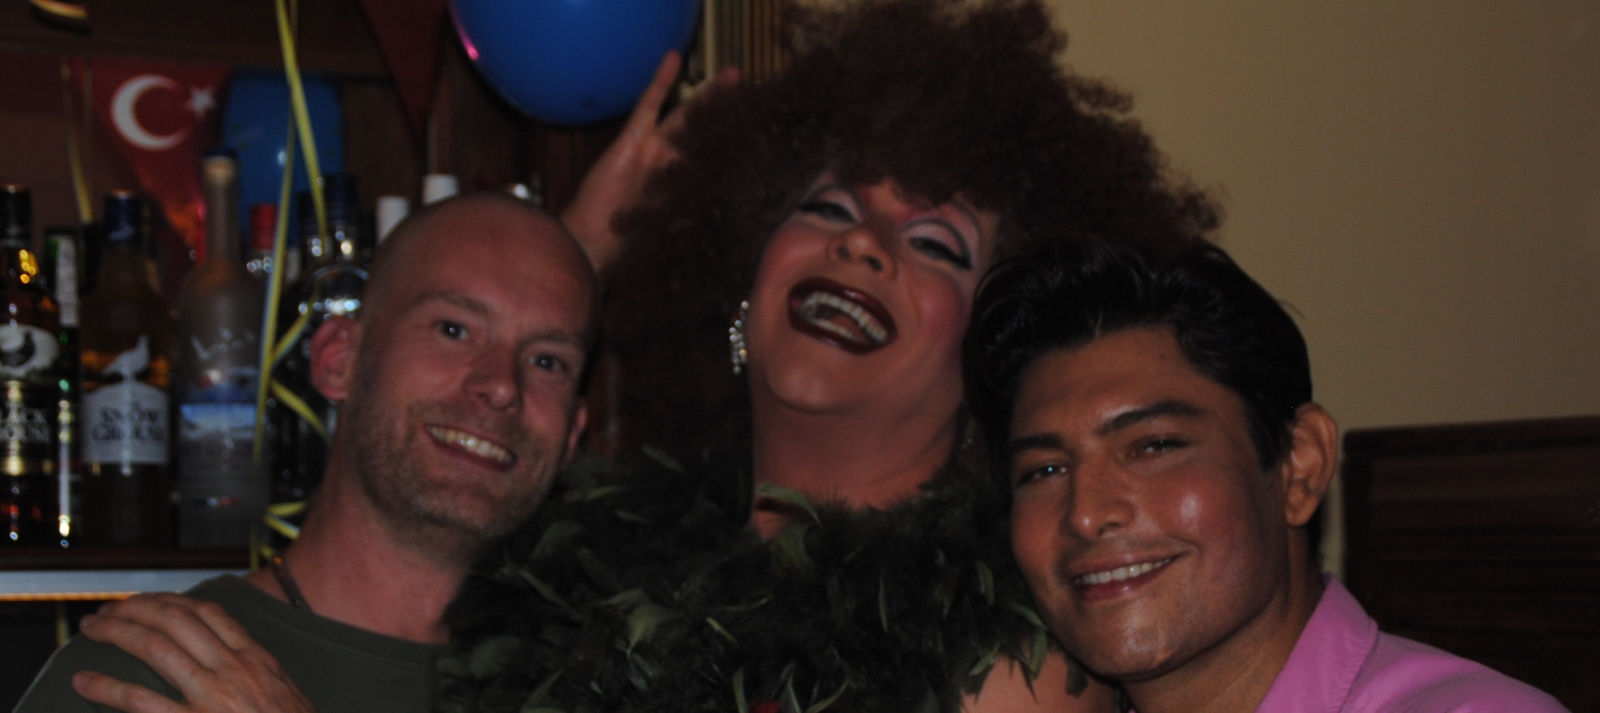 Travestieten Show Diner - leuk avondje uit in theaterrestaurant Amsterdam